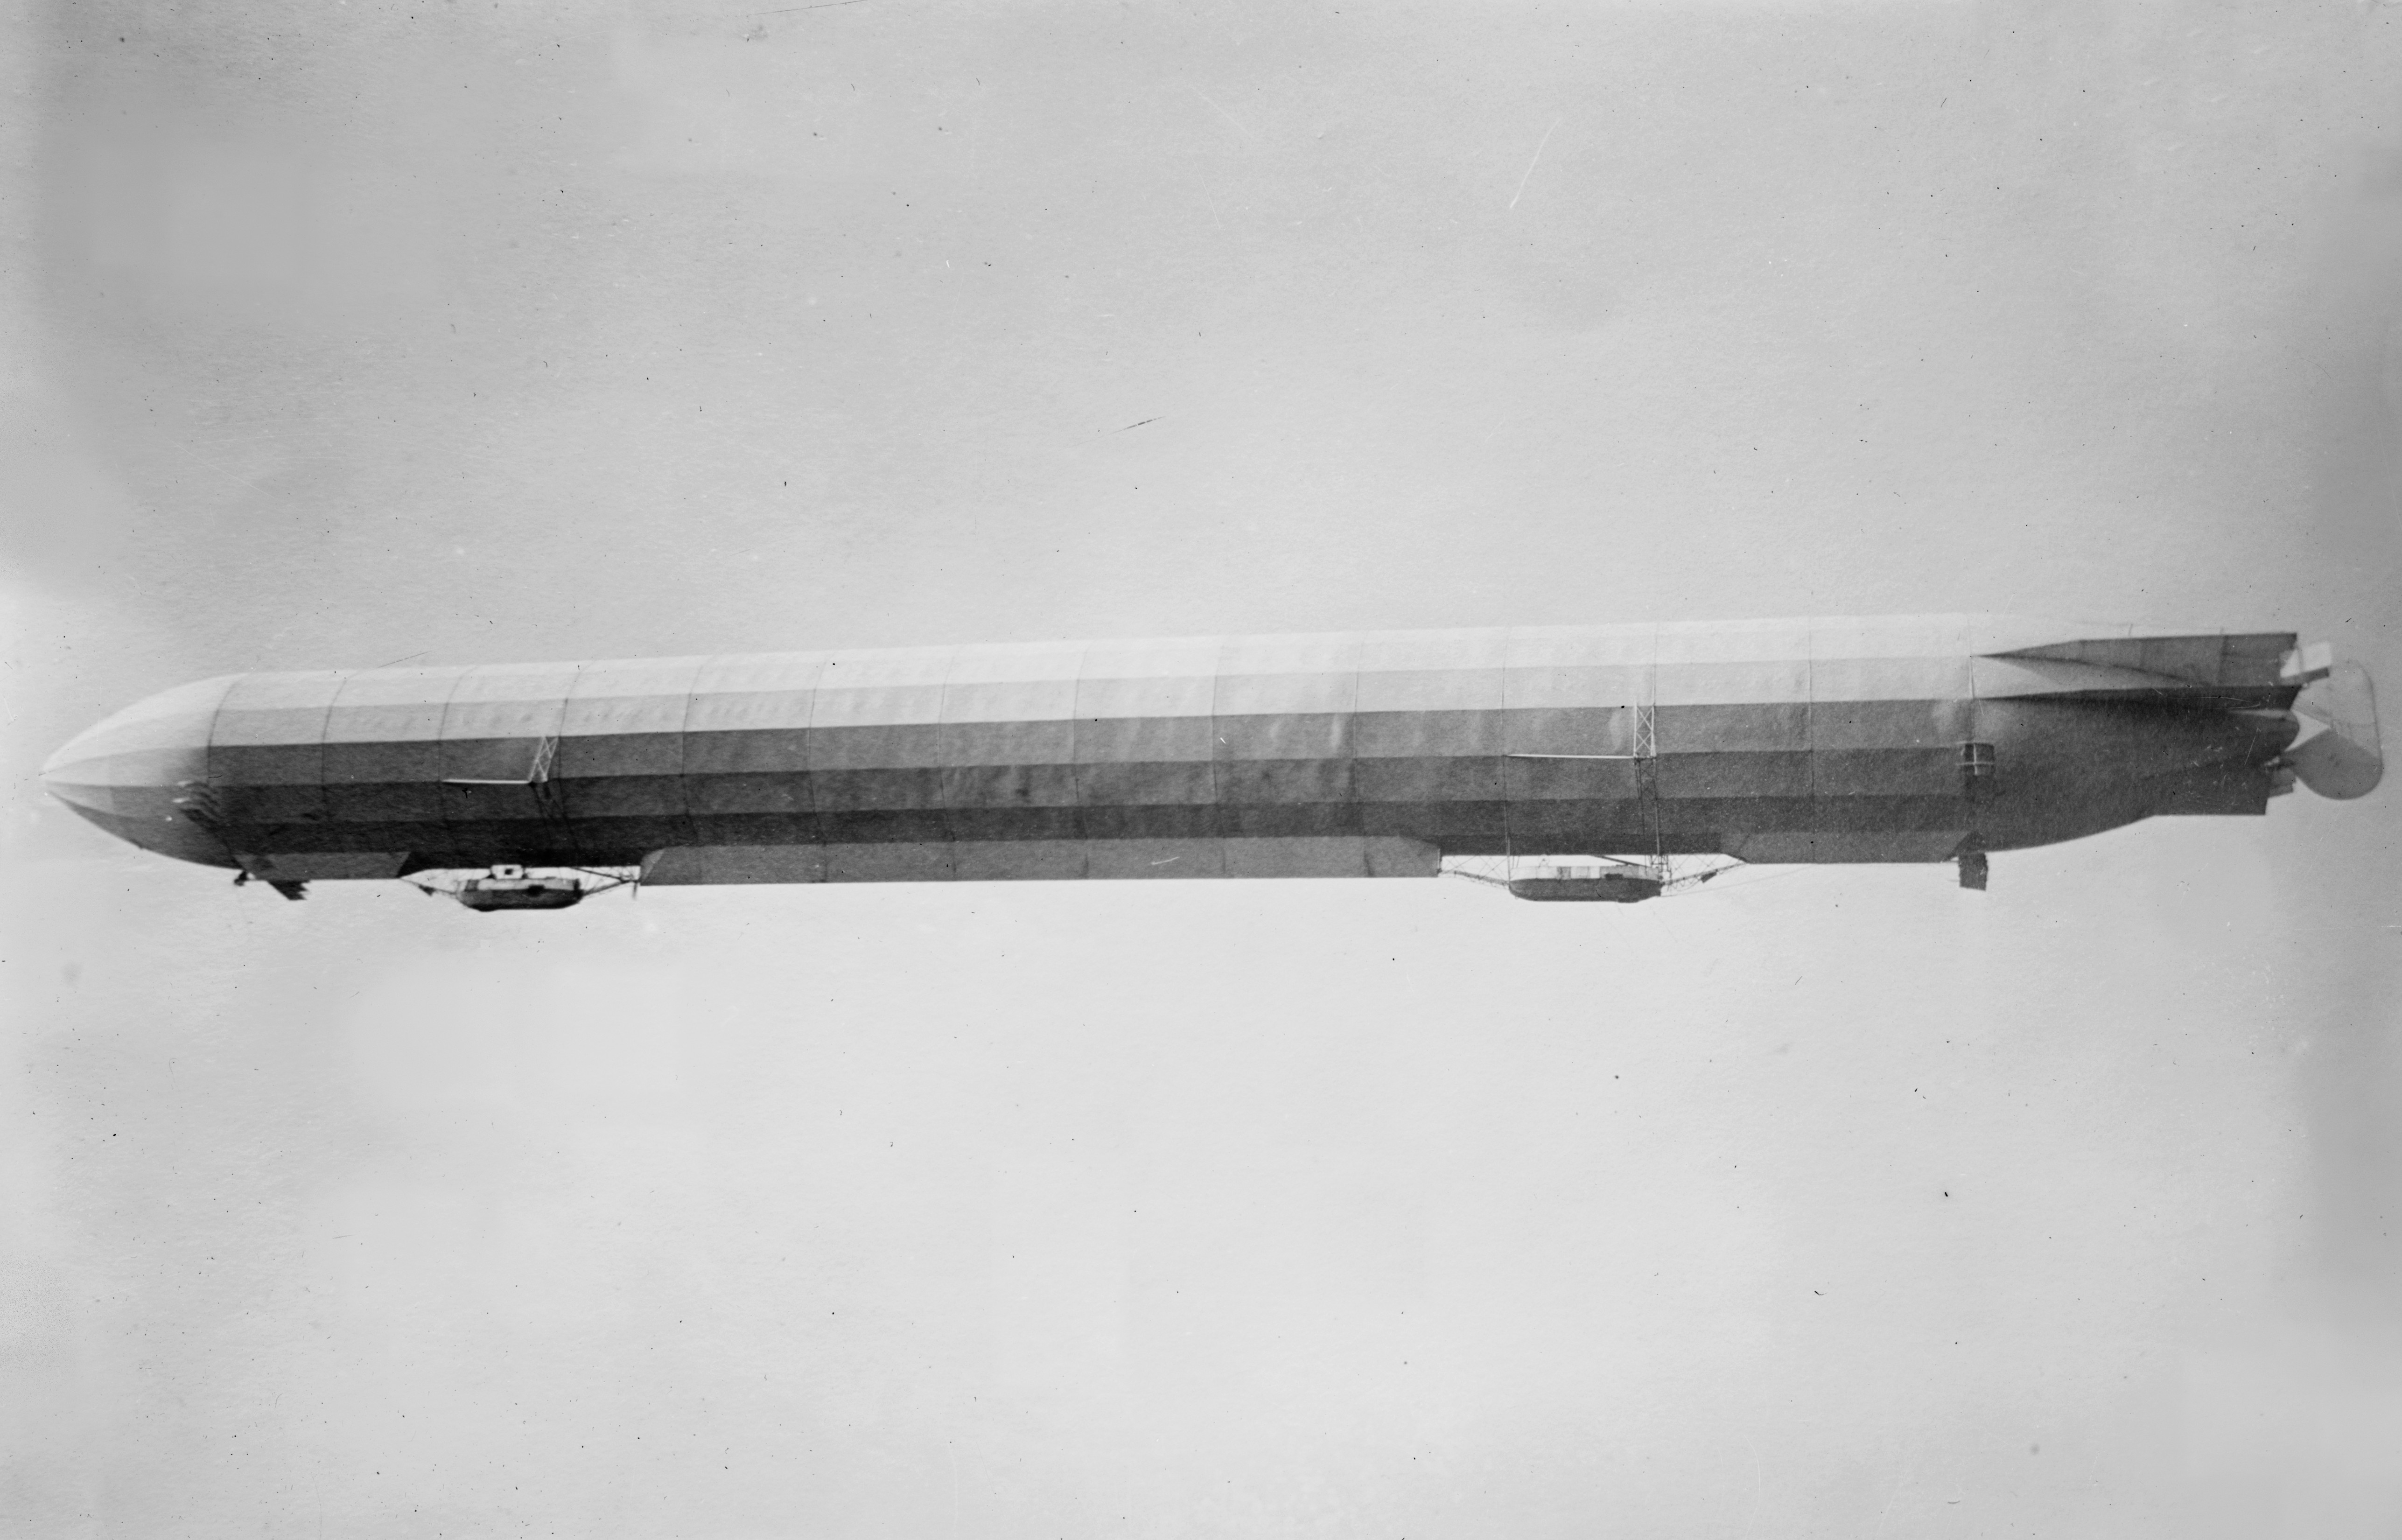 Lighter than Air Craft Zeppelin_III_in_flight